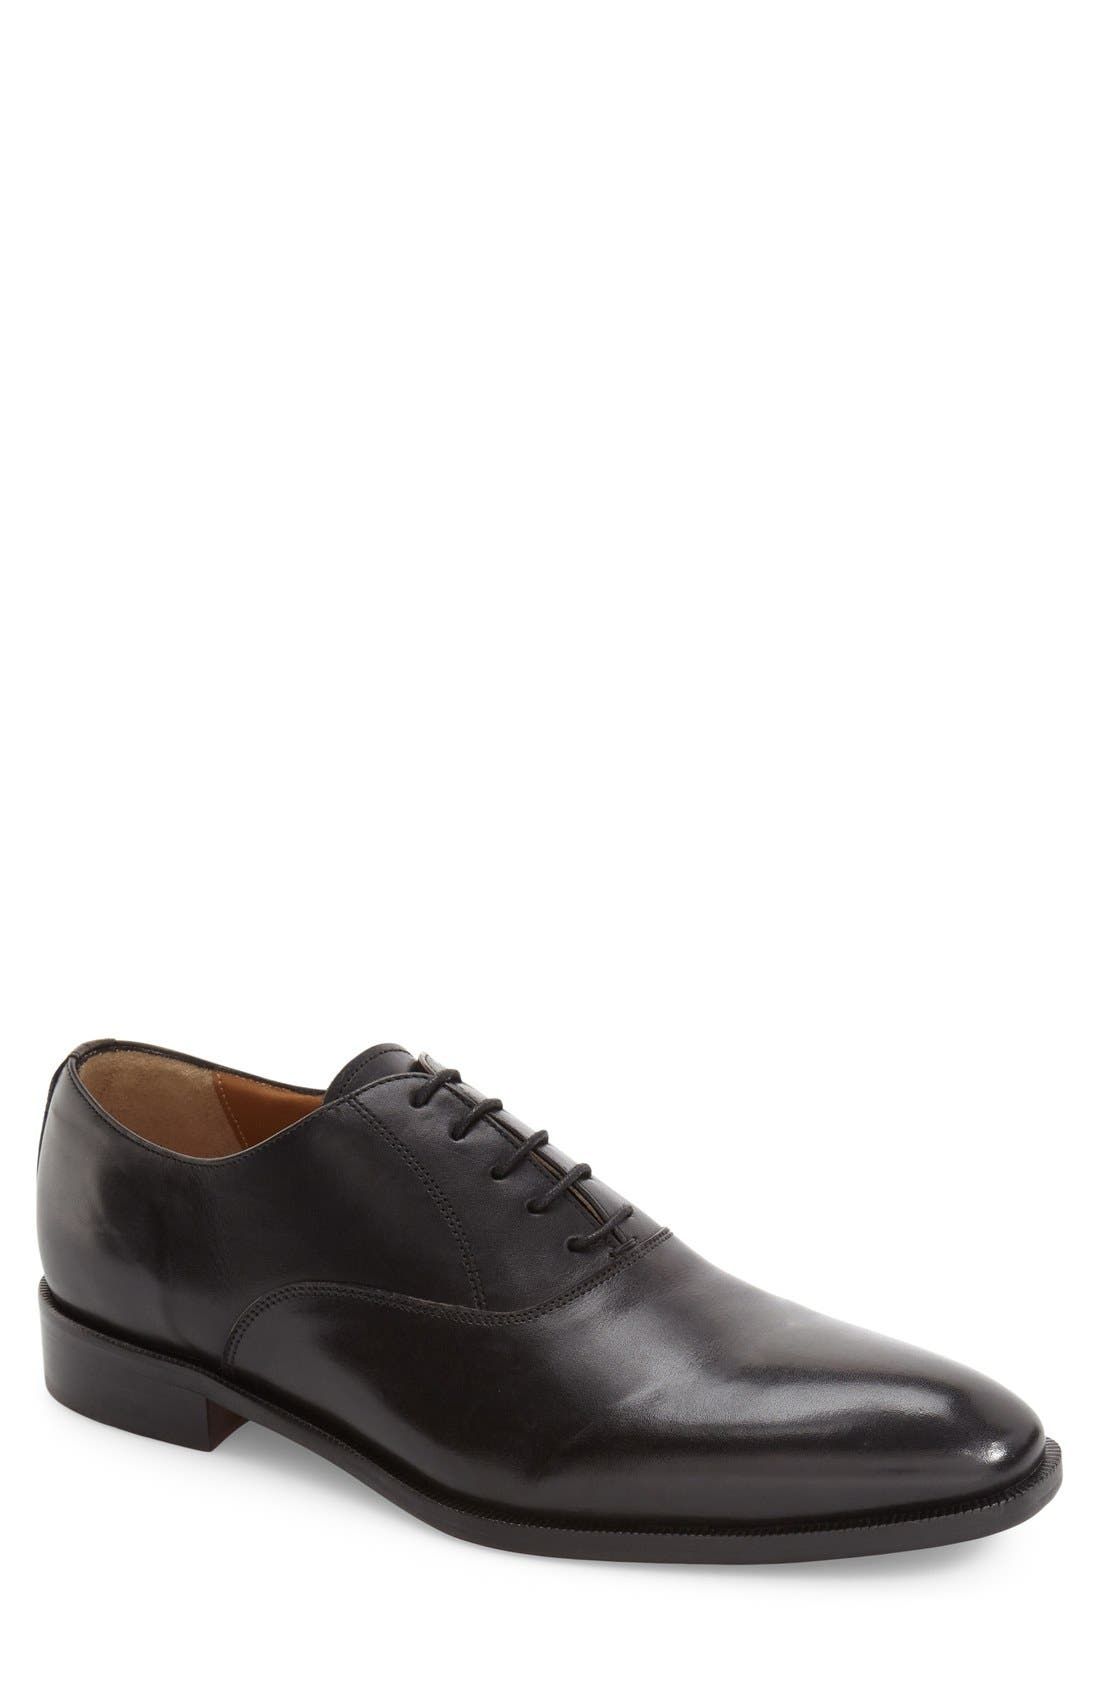 Top Coat Plain Toe Oxford,                             Main thumbnail 1, color,                             001